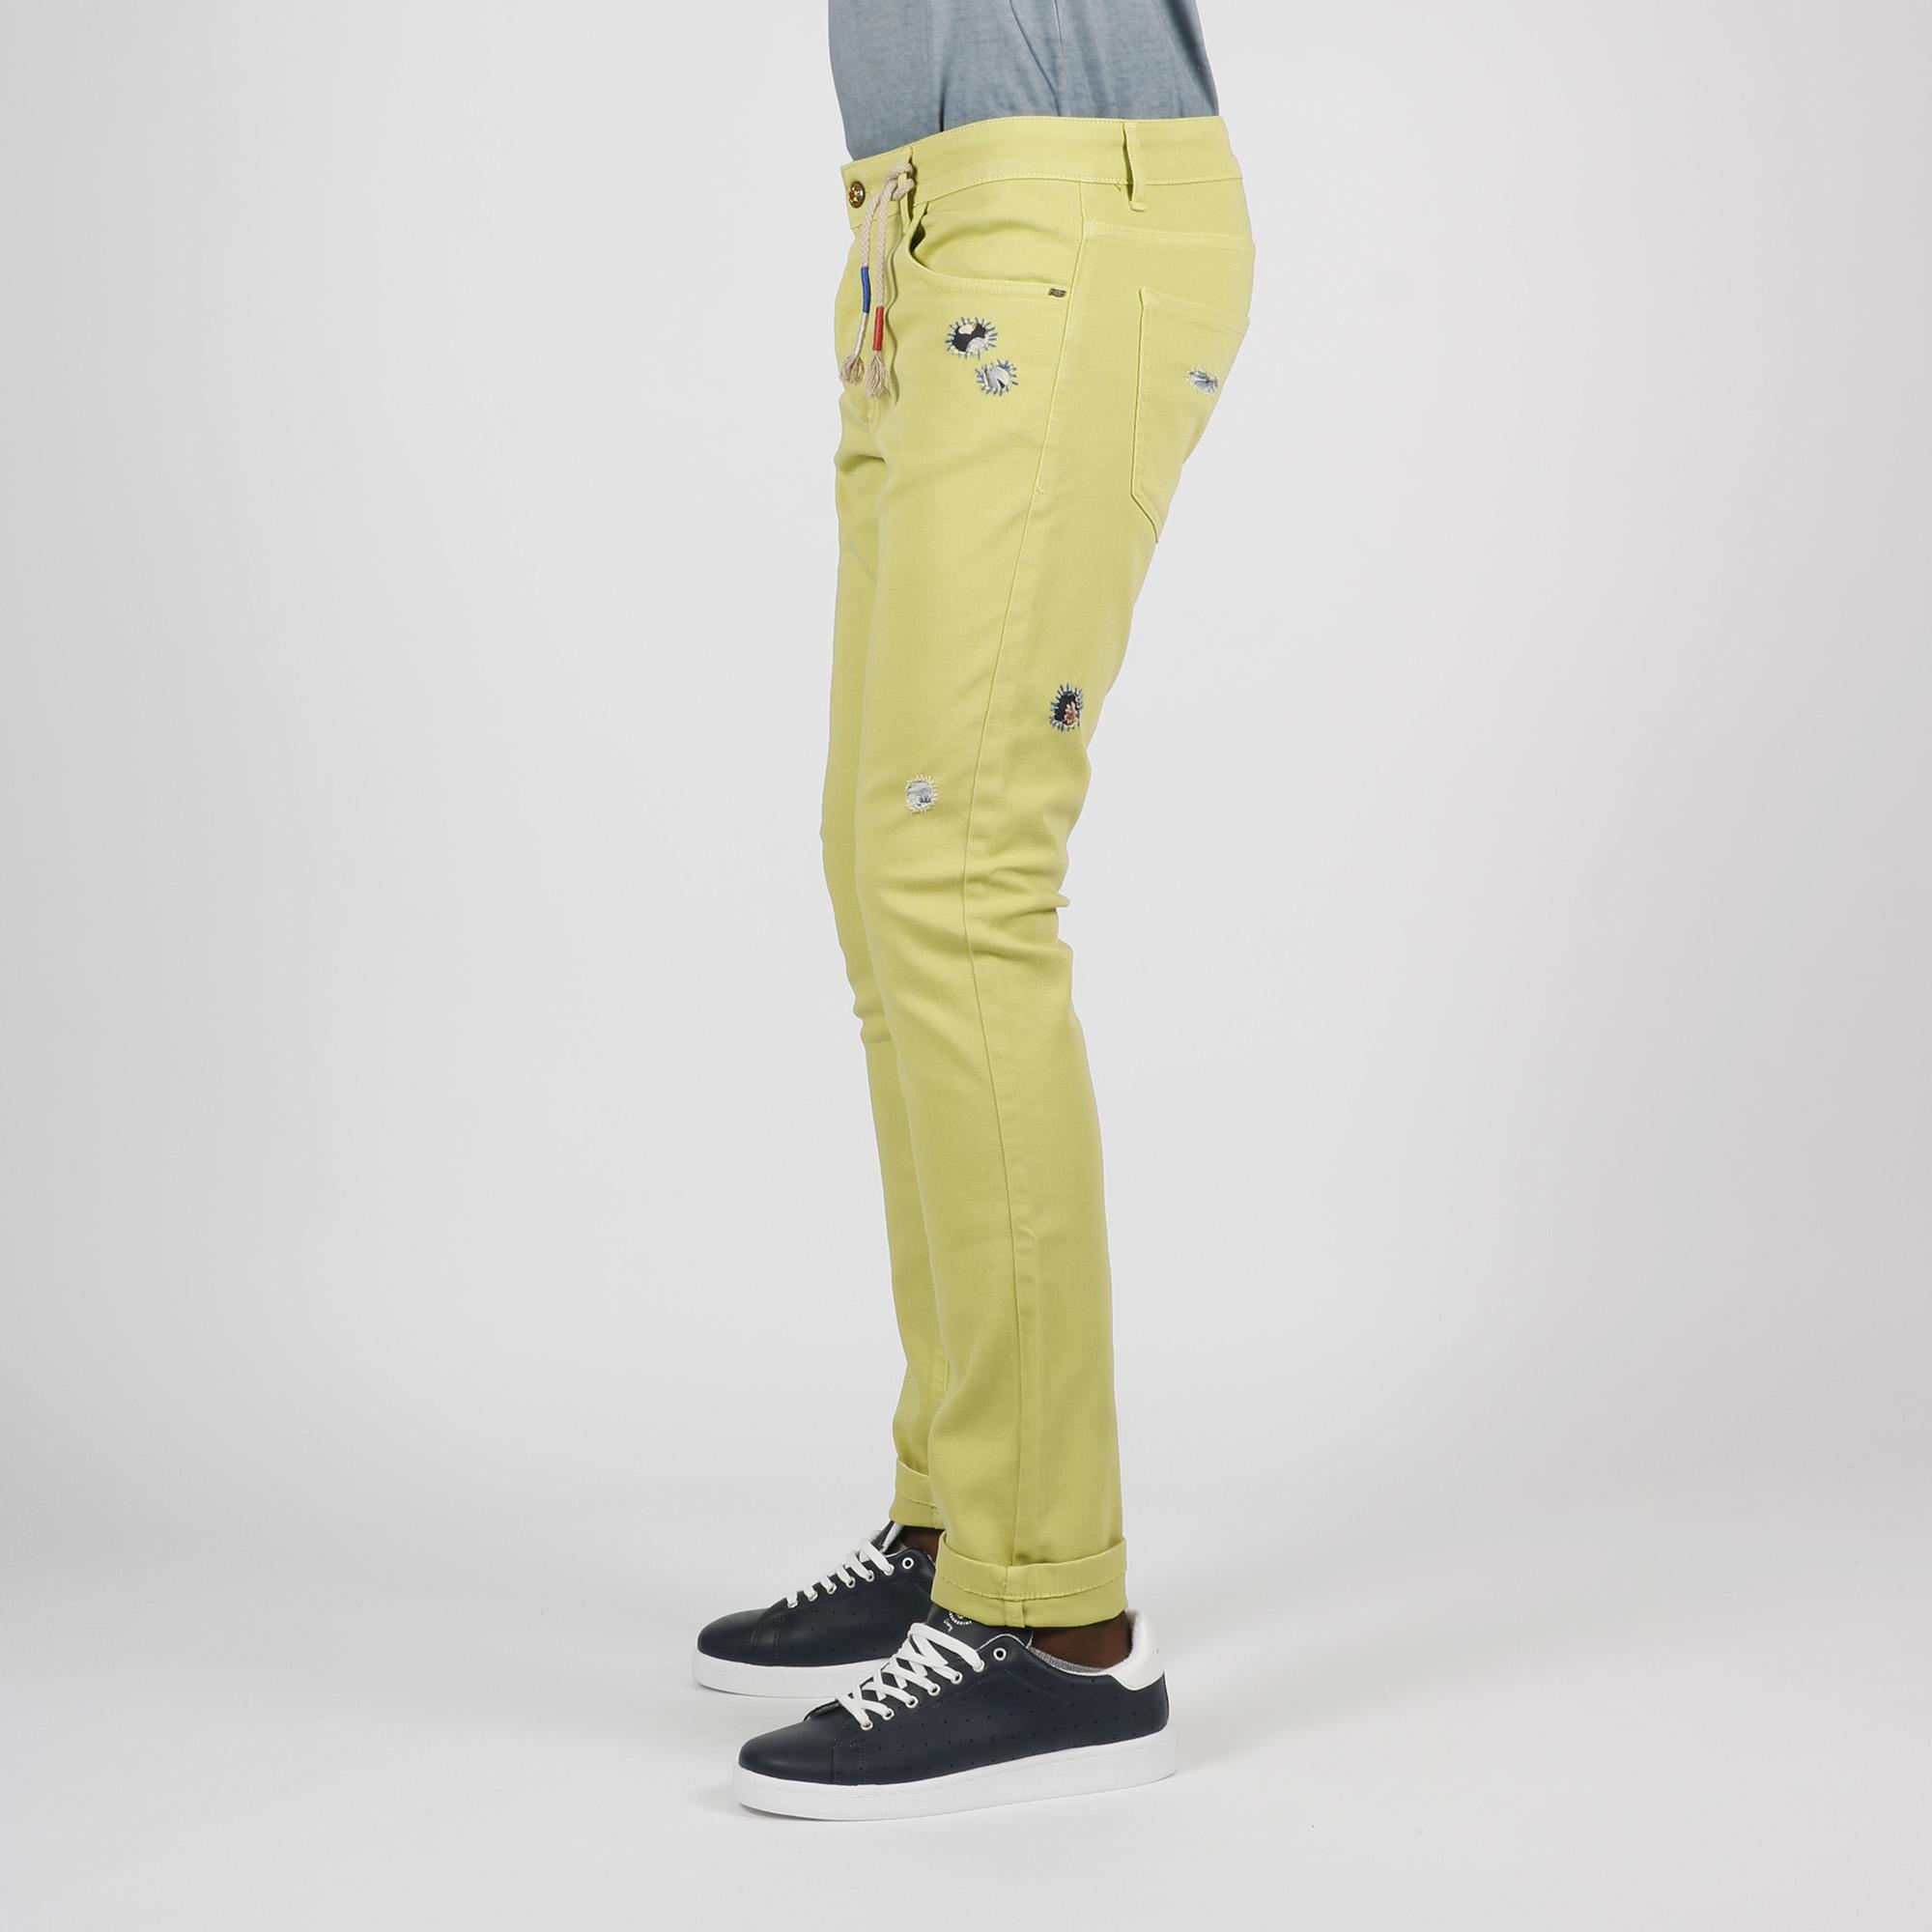 Jeans bull - Pistacchio